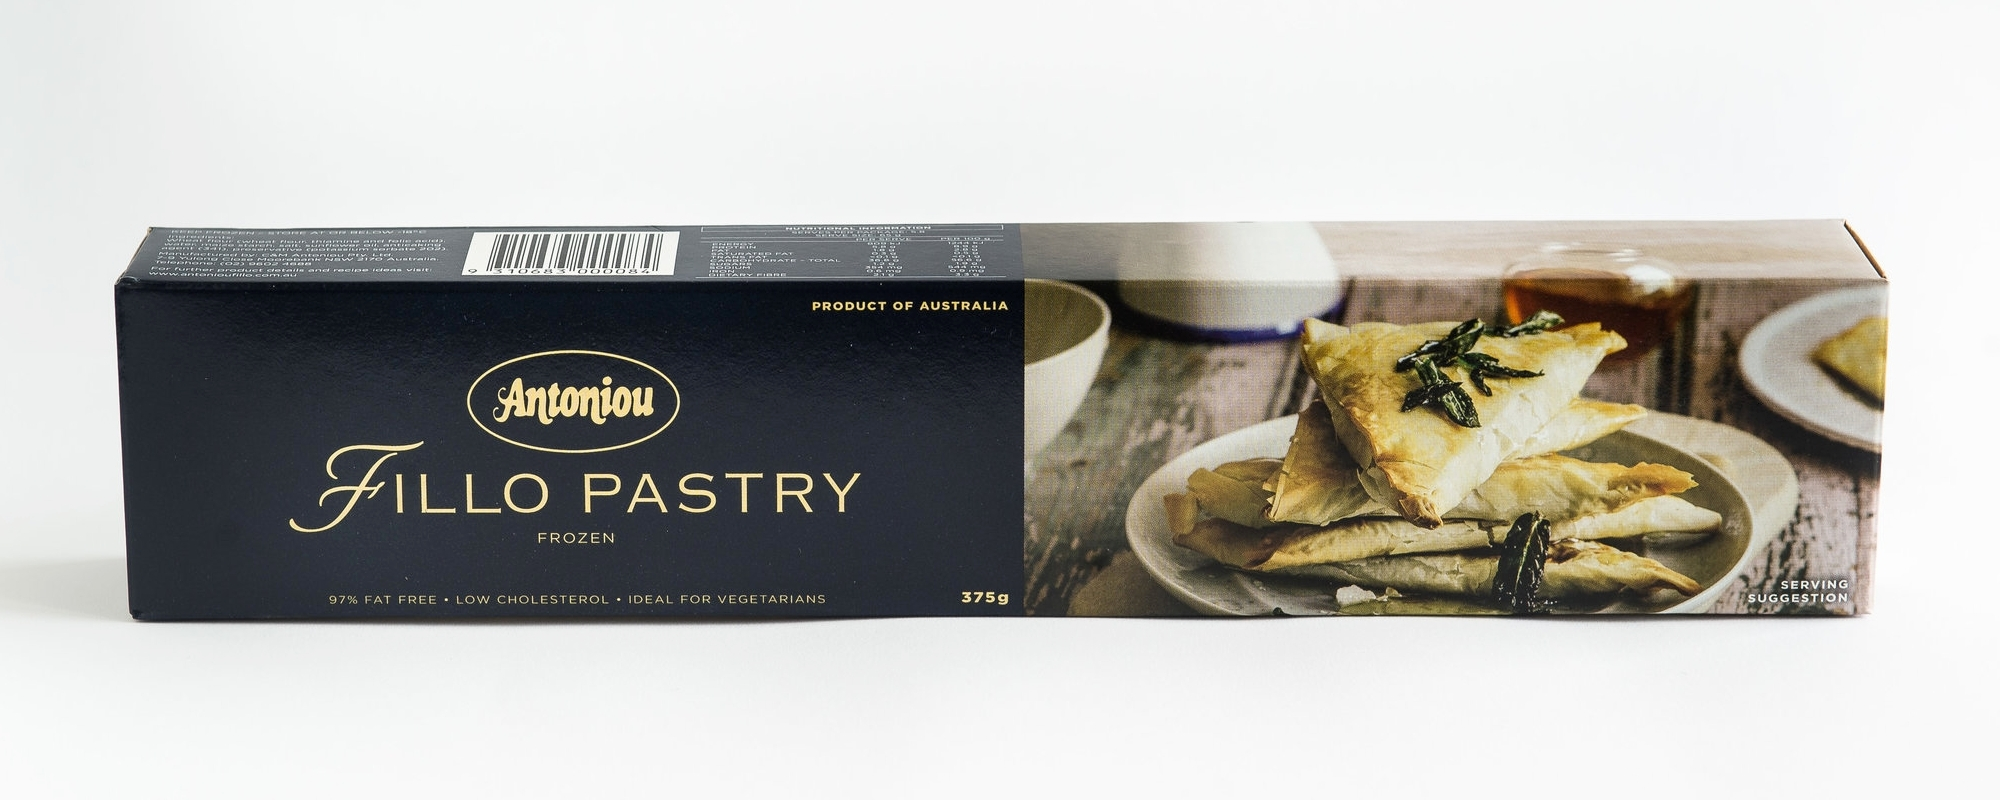 Antoniou-Frozen-Fillo-Pastry